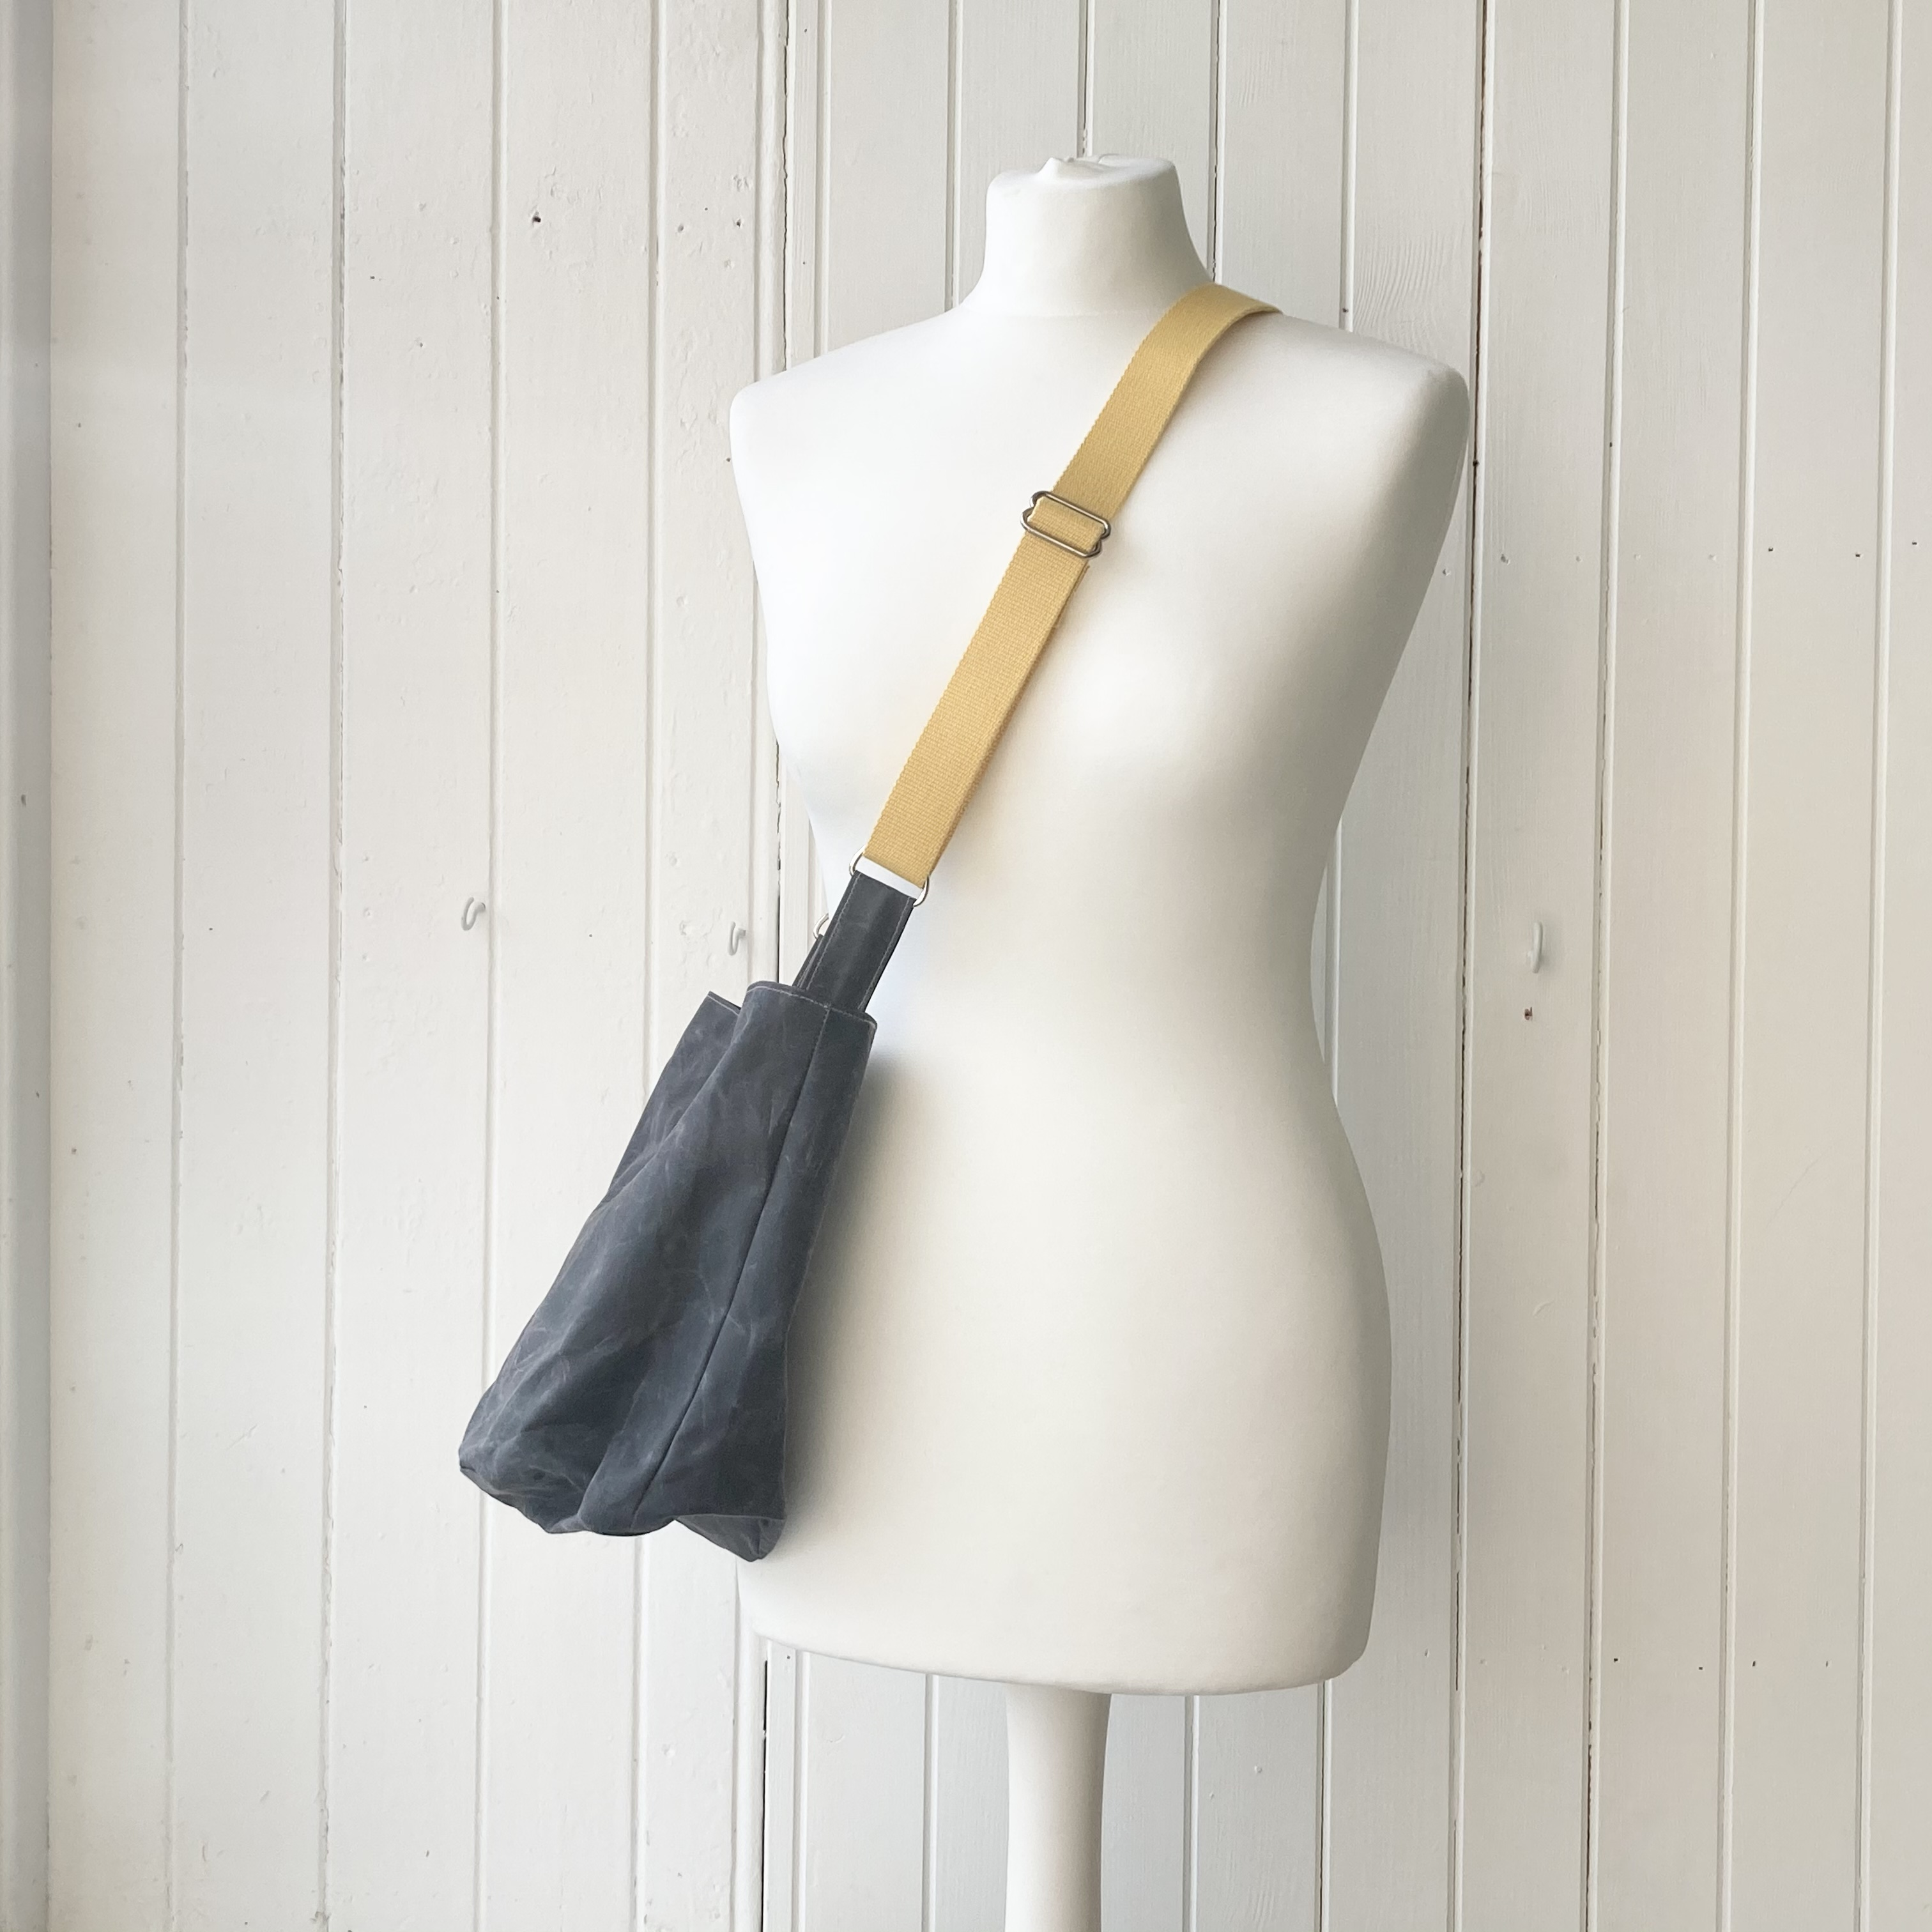 small grey and yellow oilskin bag